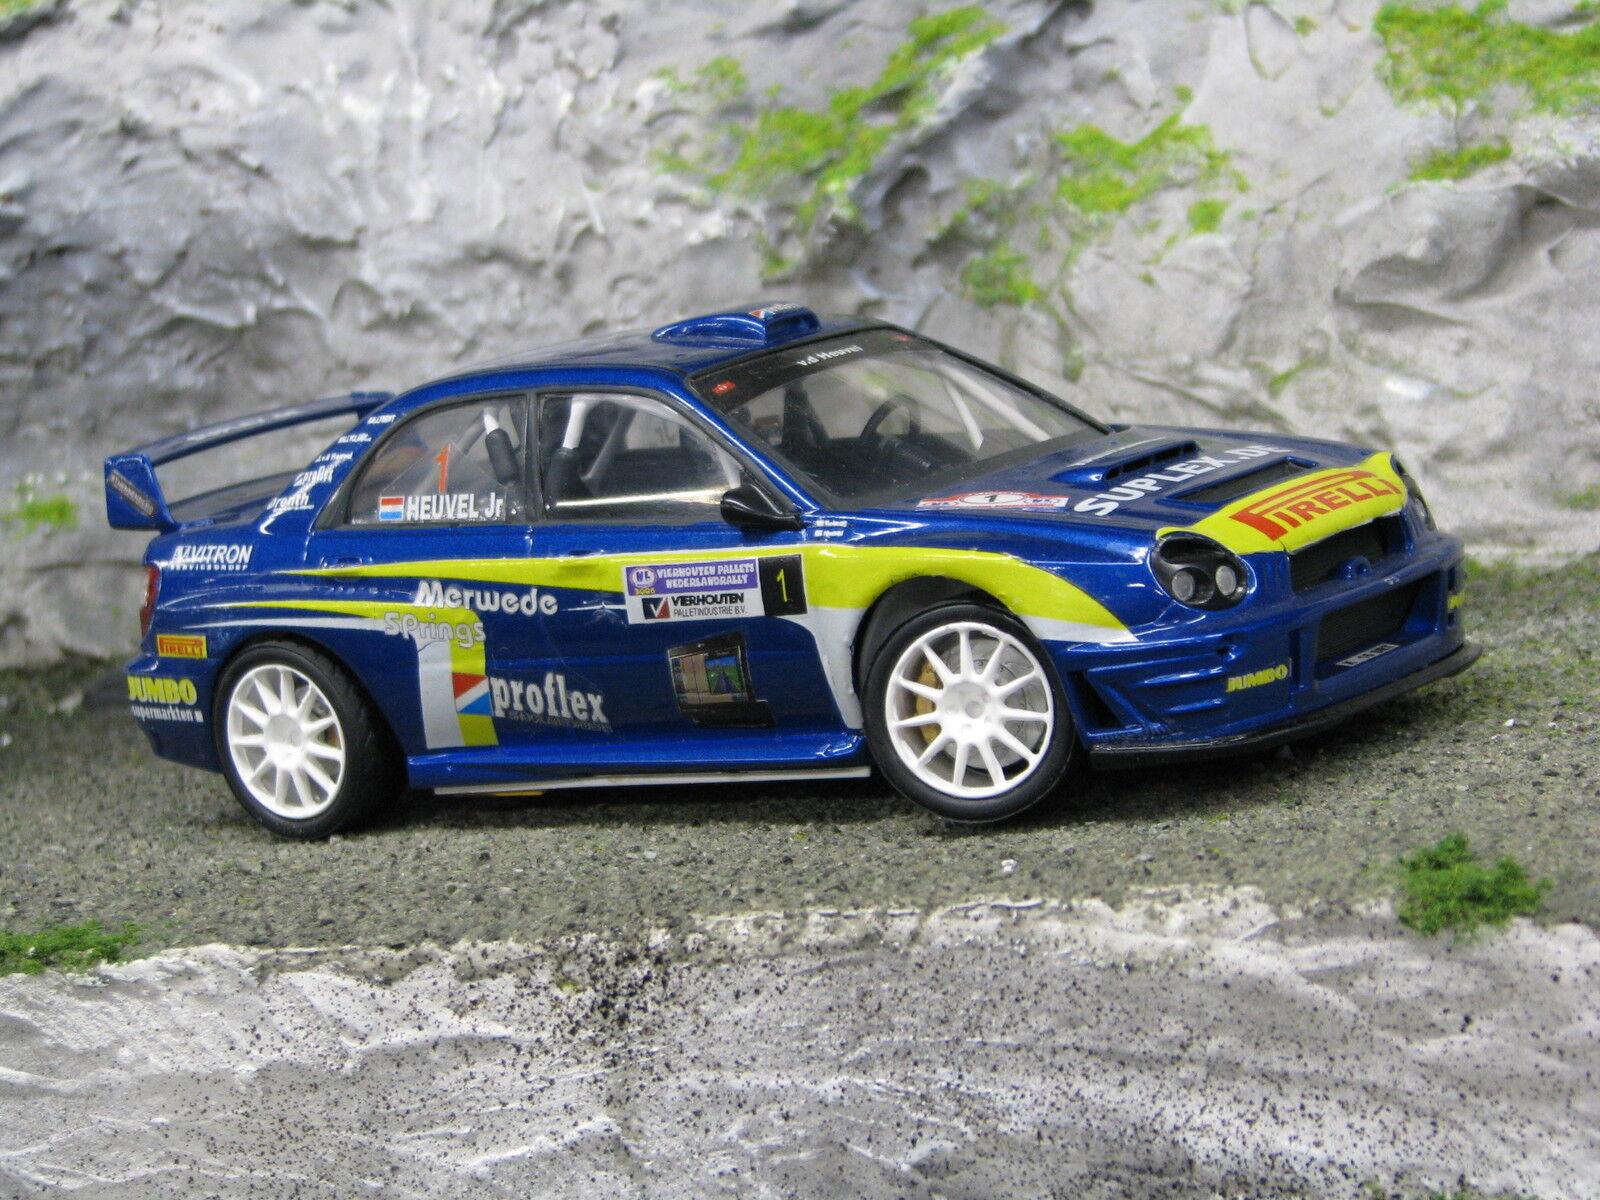 QSP Subaru Impreza S7 WRC '01 1 24 van den Heuvel   Kolman Barneveld Rally 06